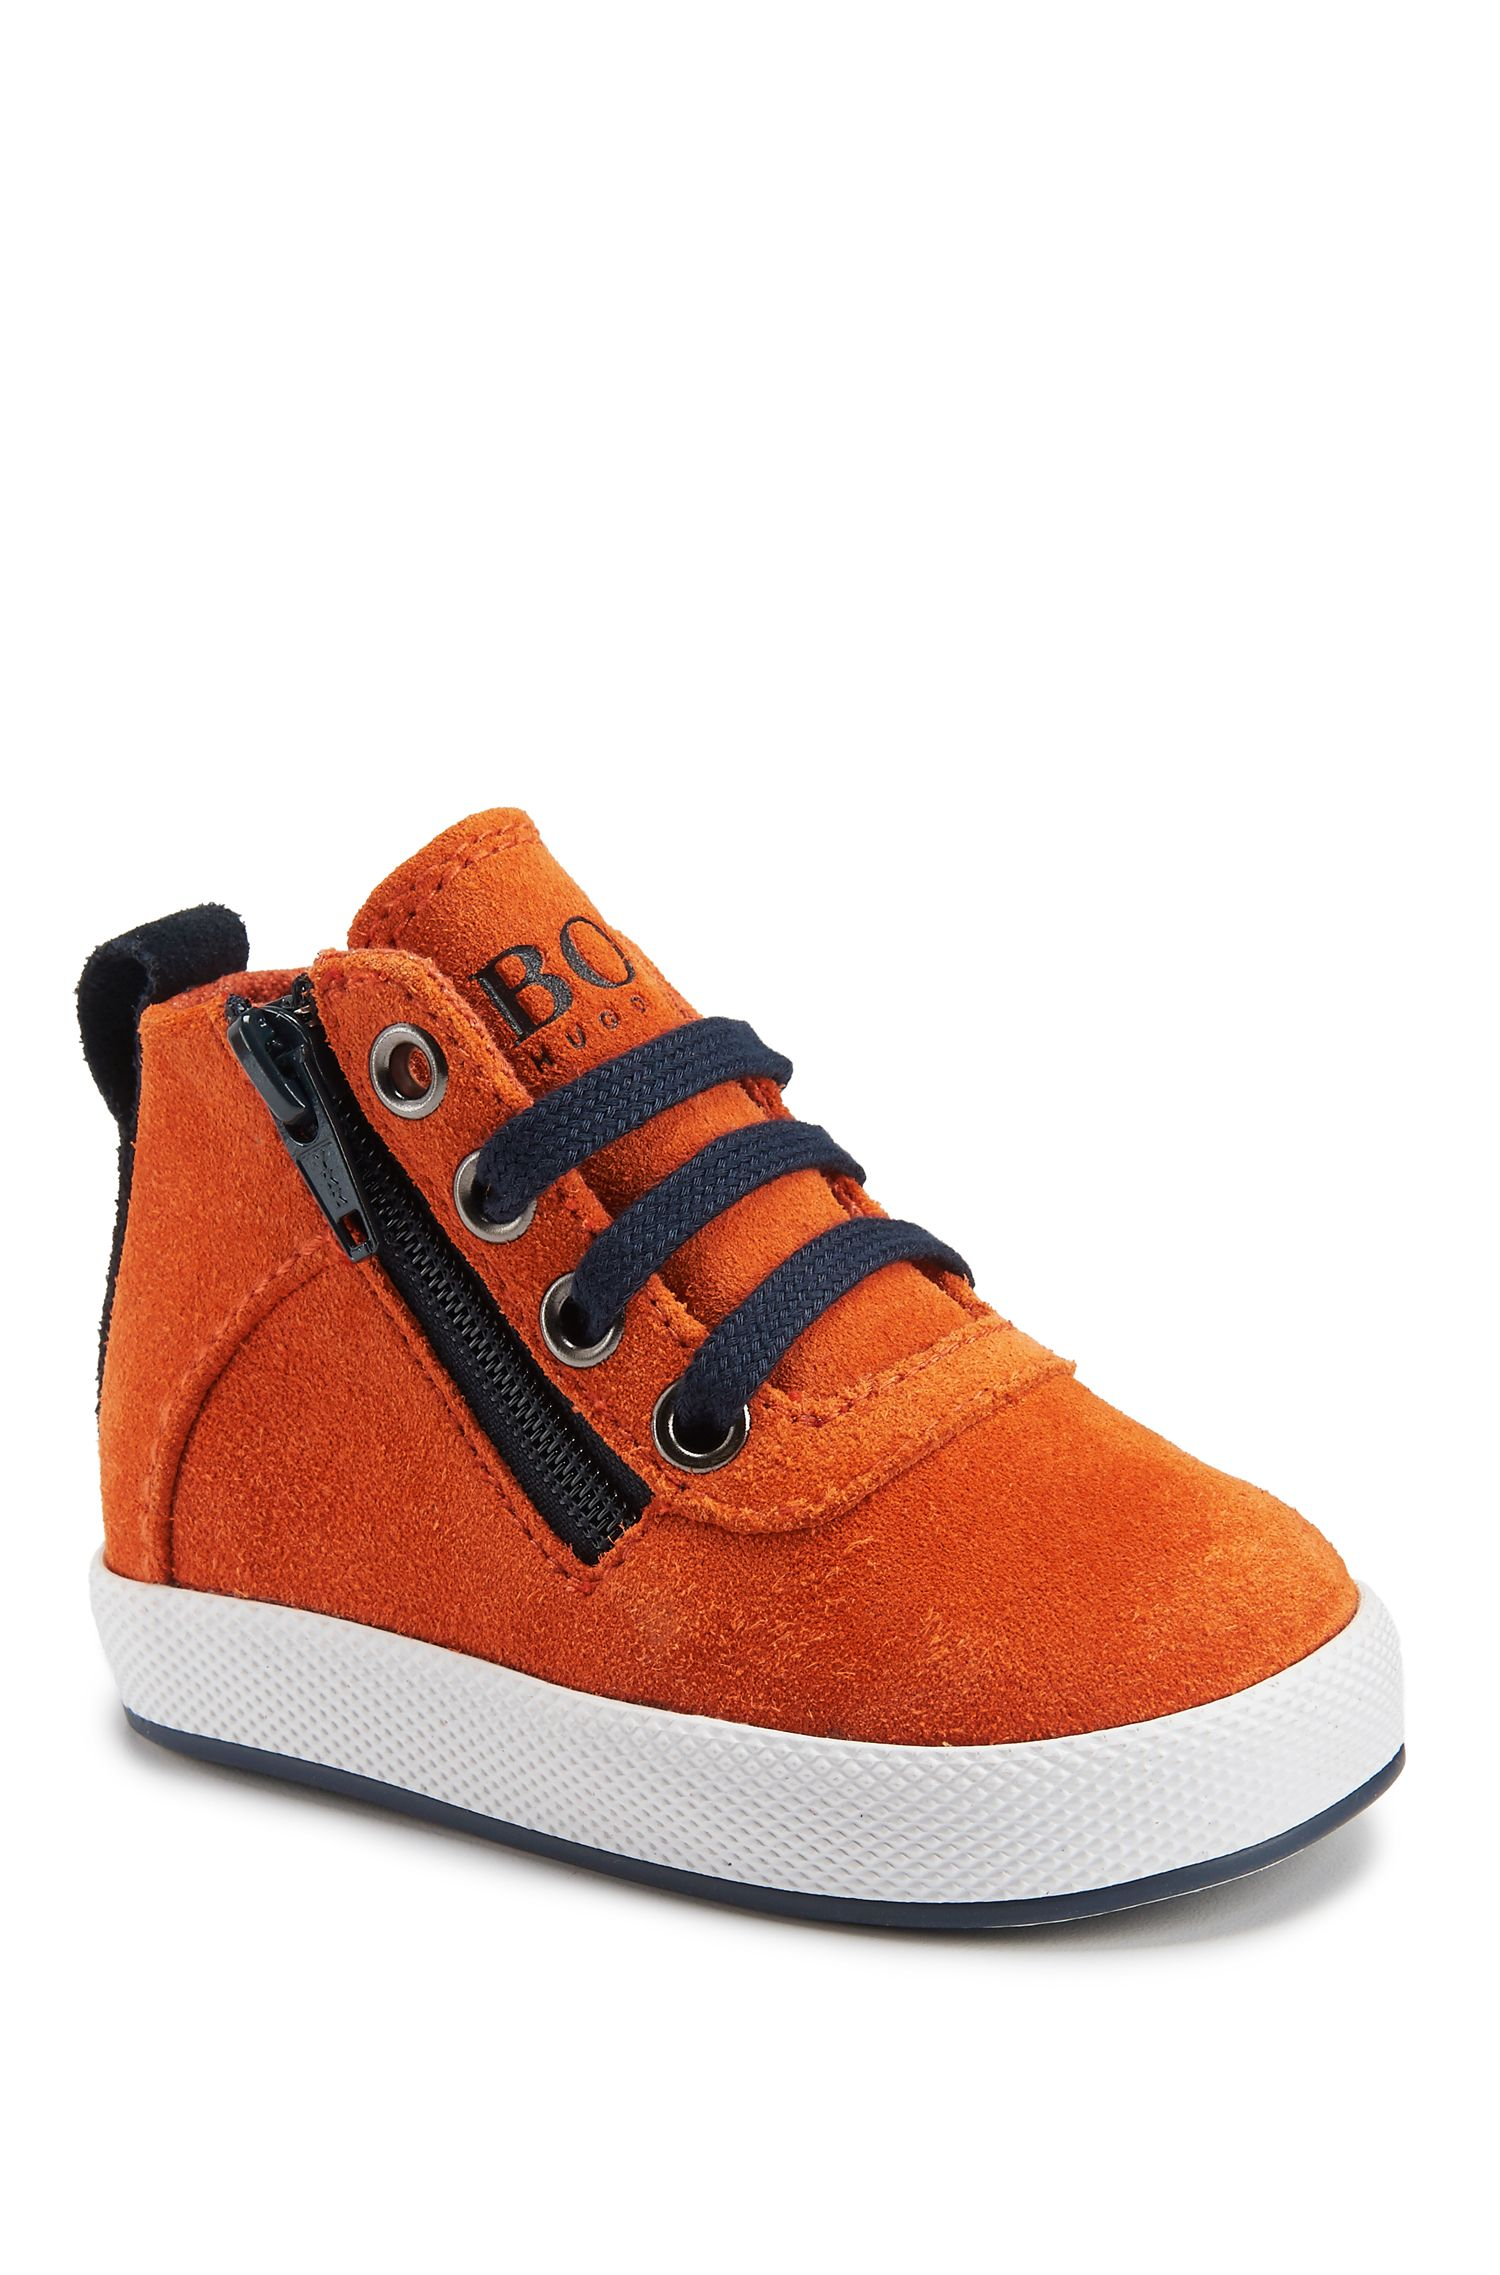 Newborn Suede Sneaker | J09084, Orange